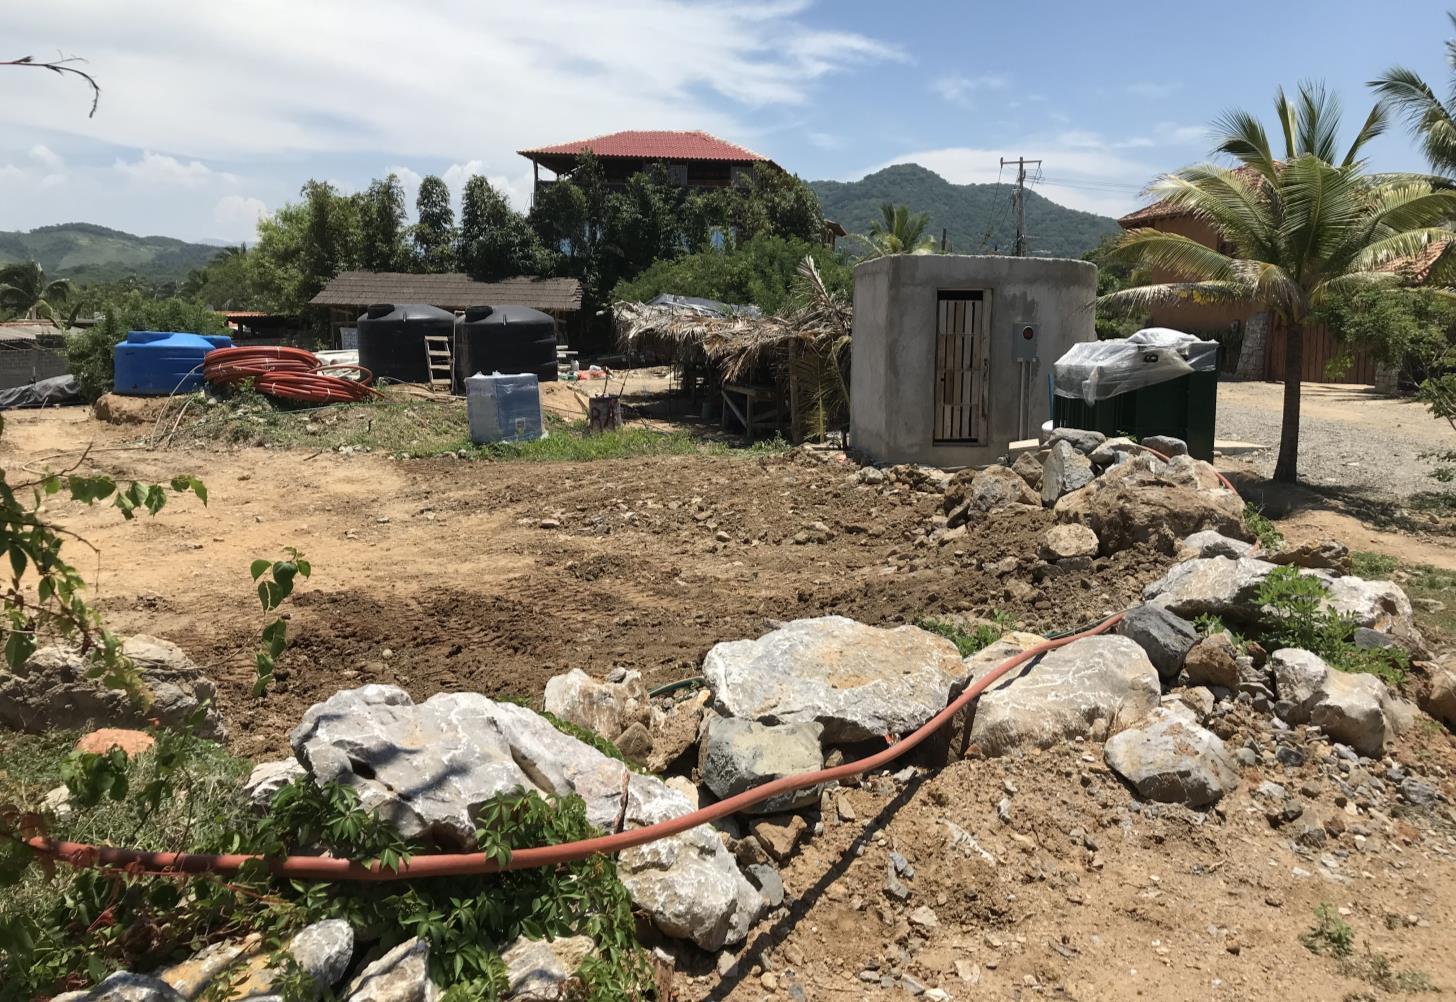 REPORTE-FOTOGRAFICO-PUNTA-MAJAHUA-12-DE-AGOSTO-DEL-2018-041.jpg